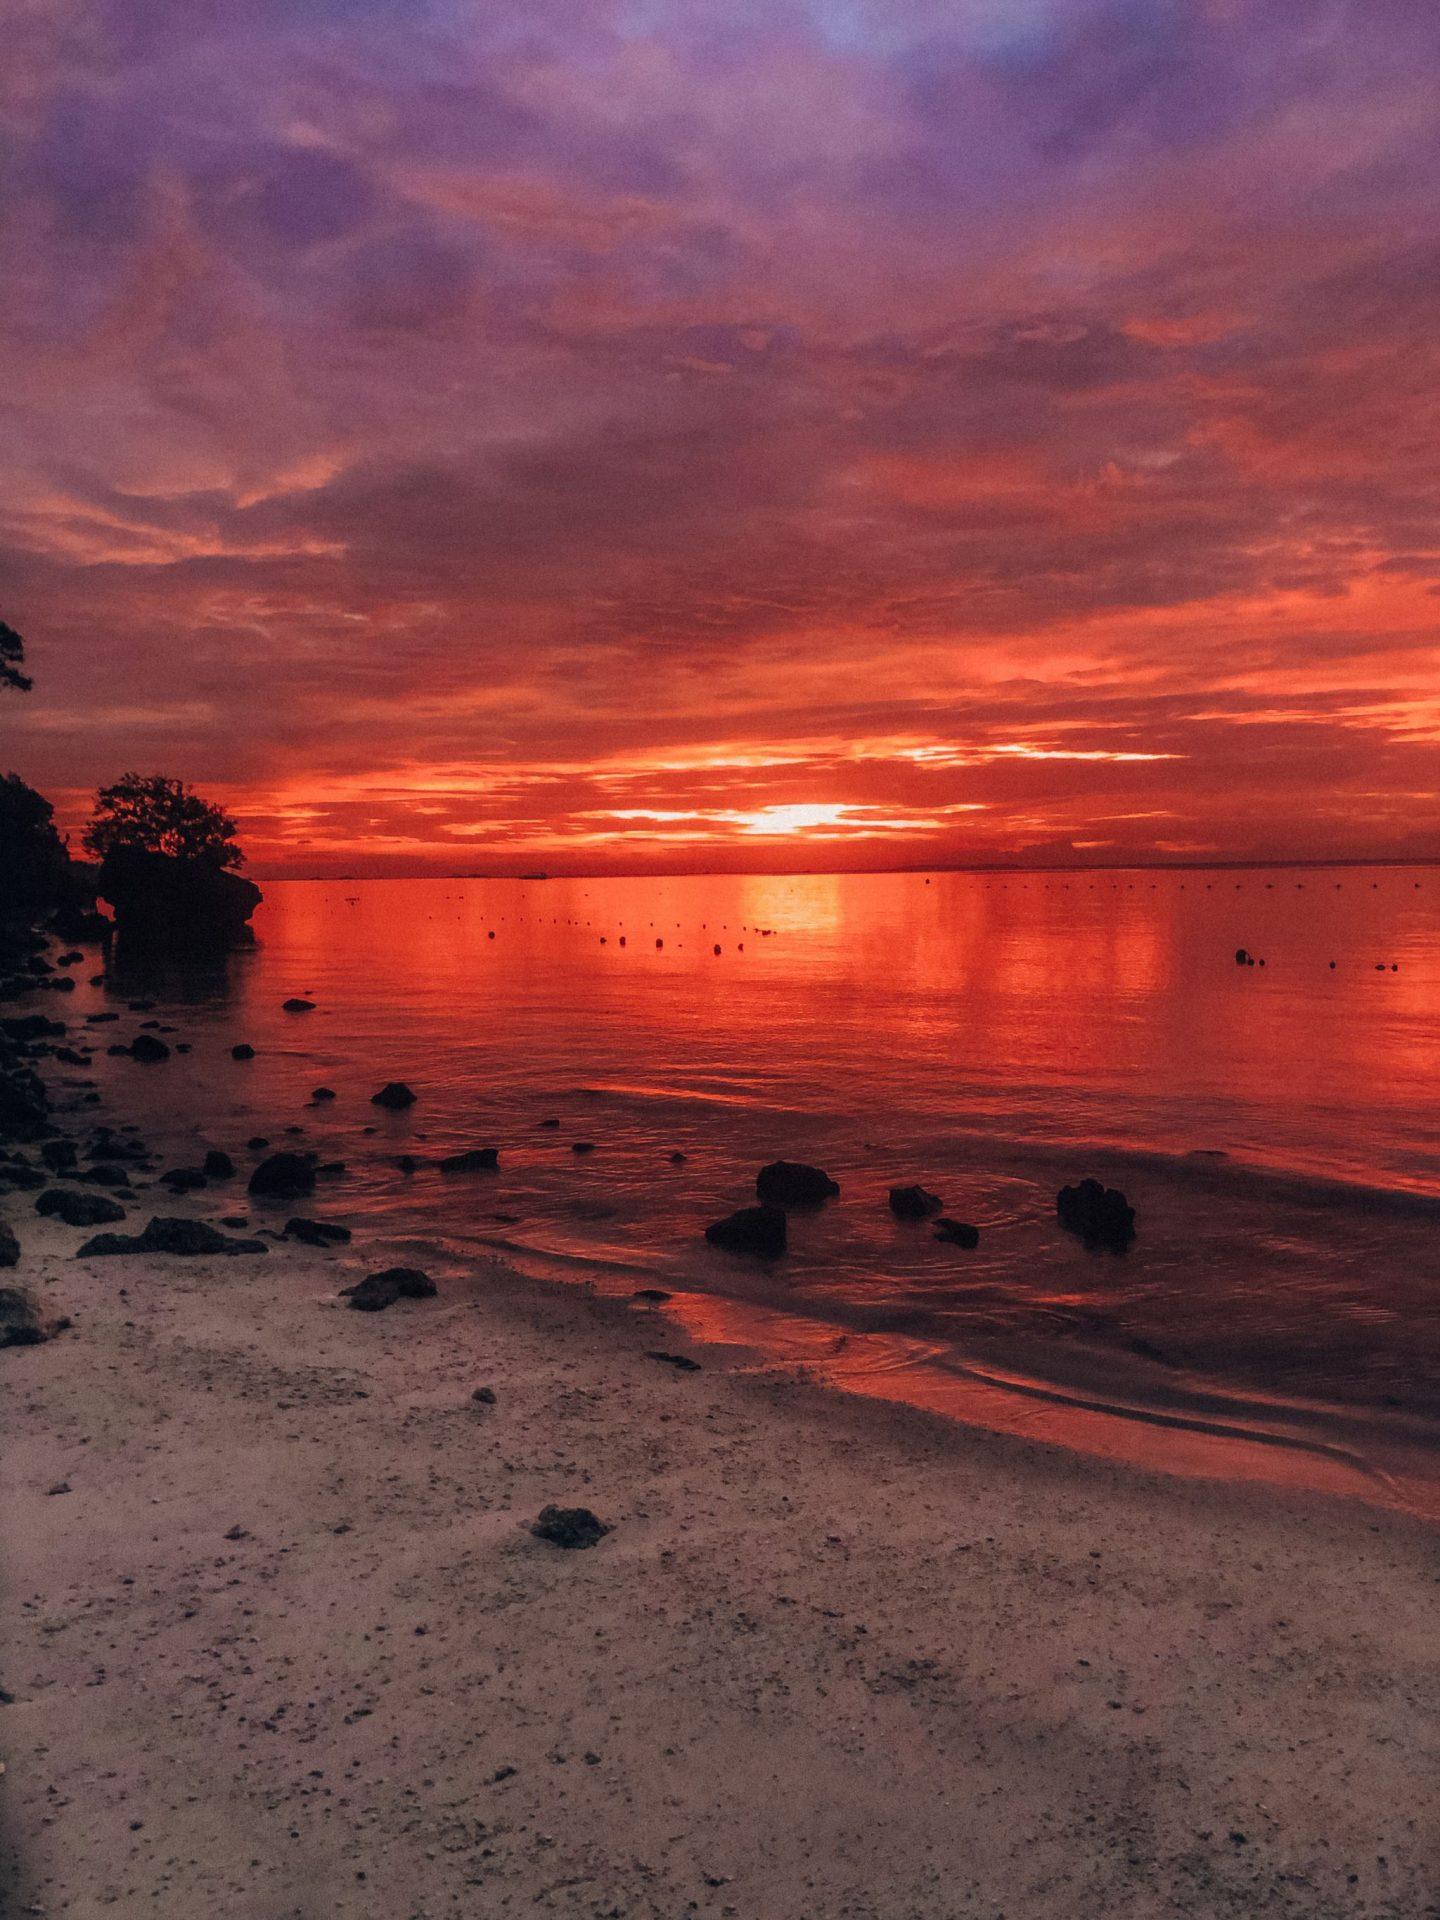 sunrise_alona_beach_lemonaidlies